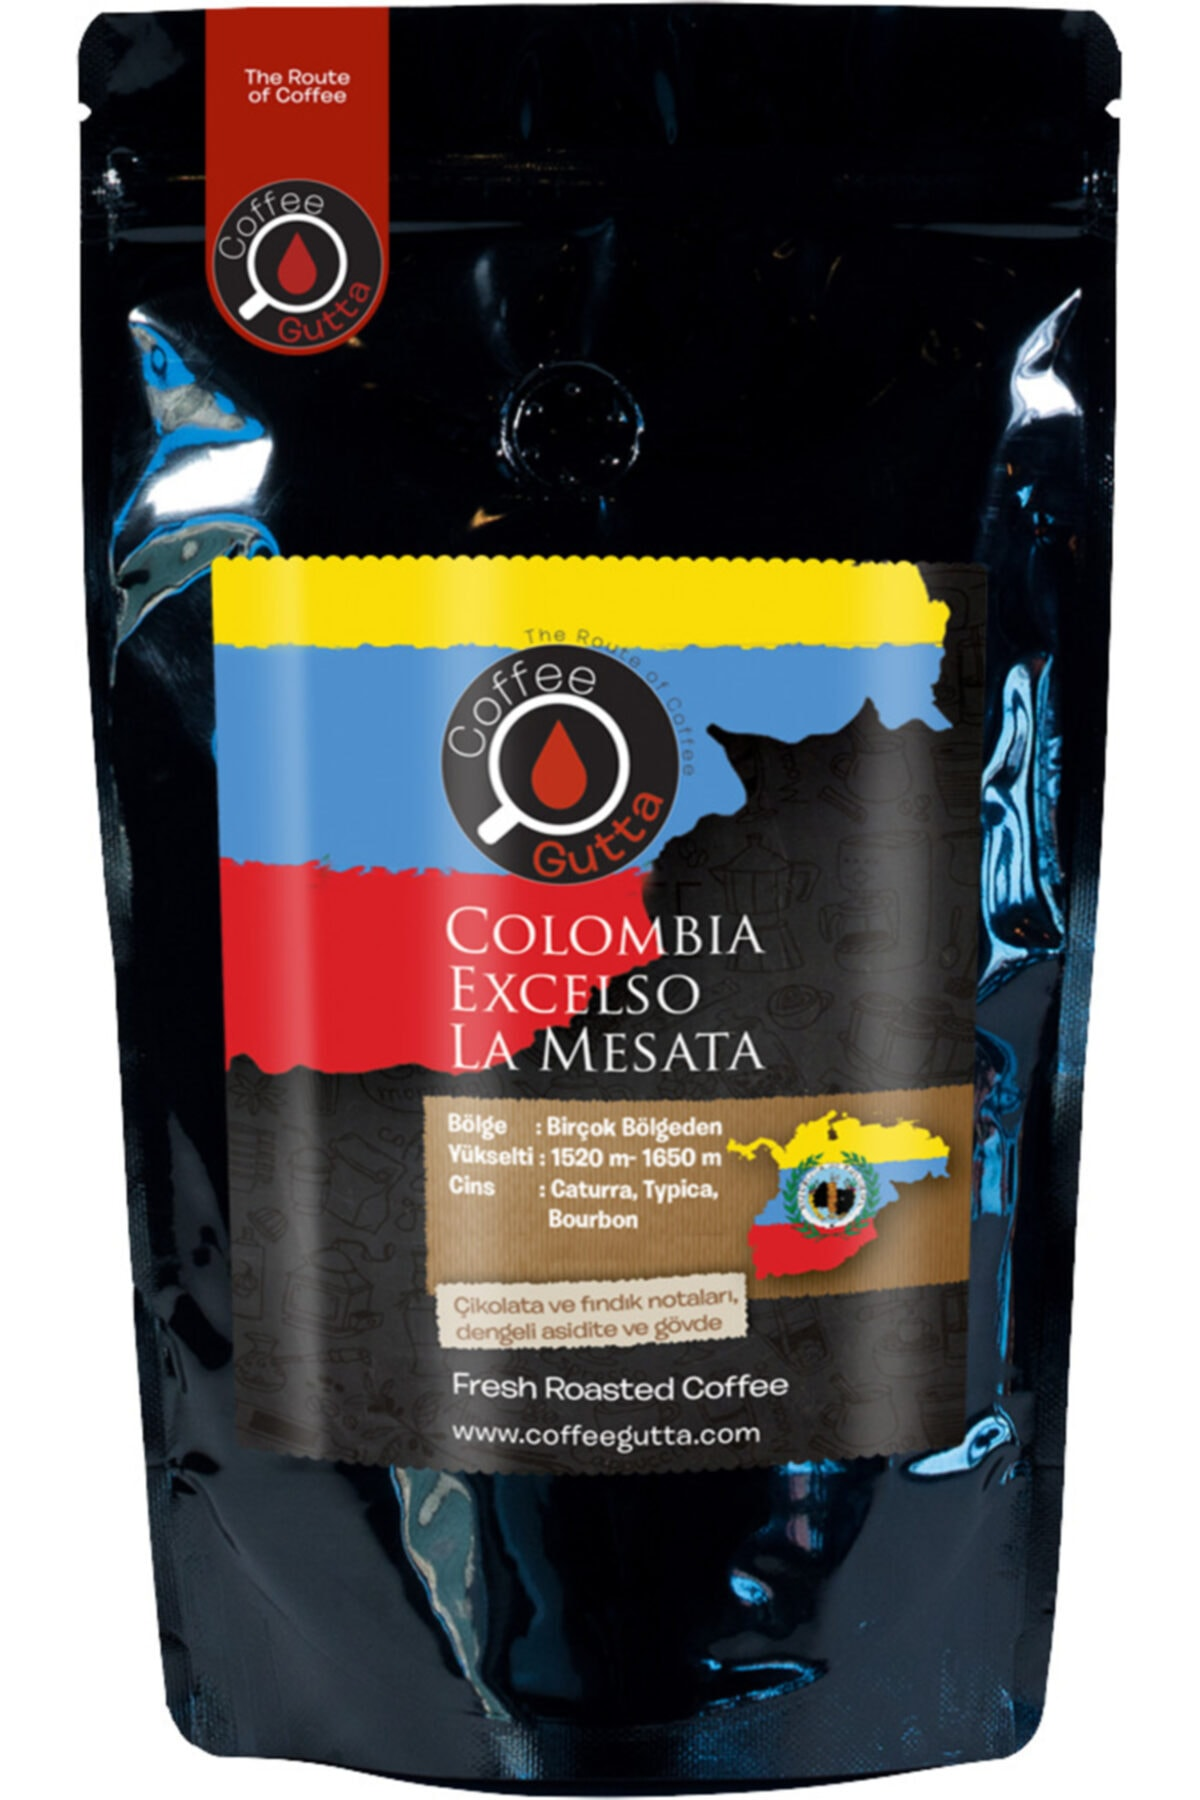 Coffee Gutta Colombia Excelso Filtre Kahve 250gr | French Press Için Öğütülmüş 1